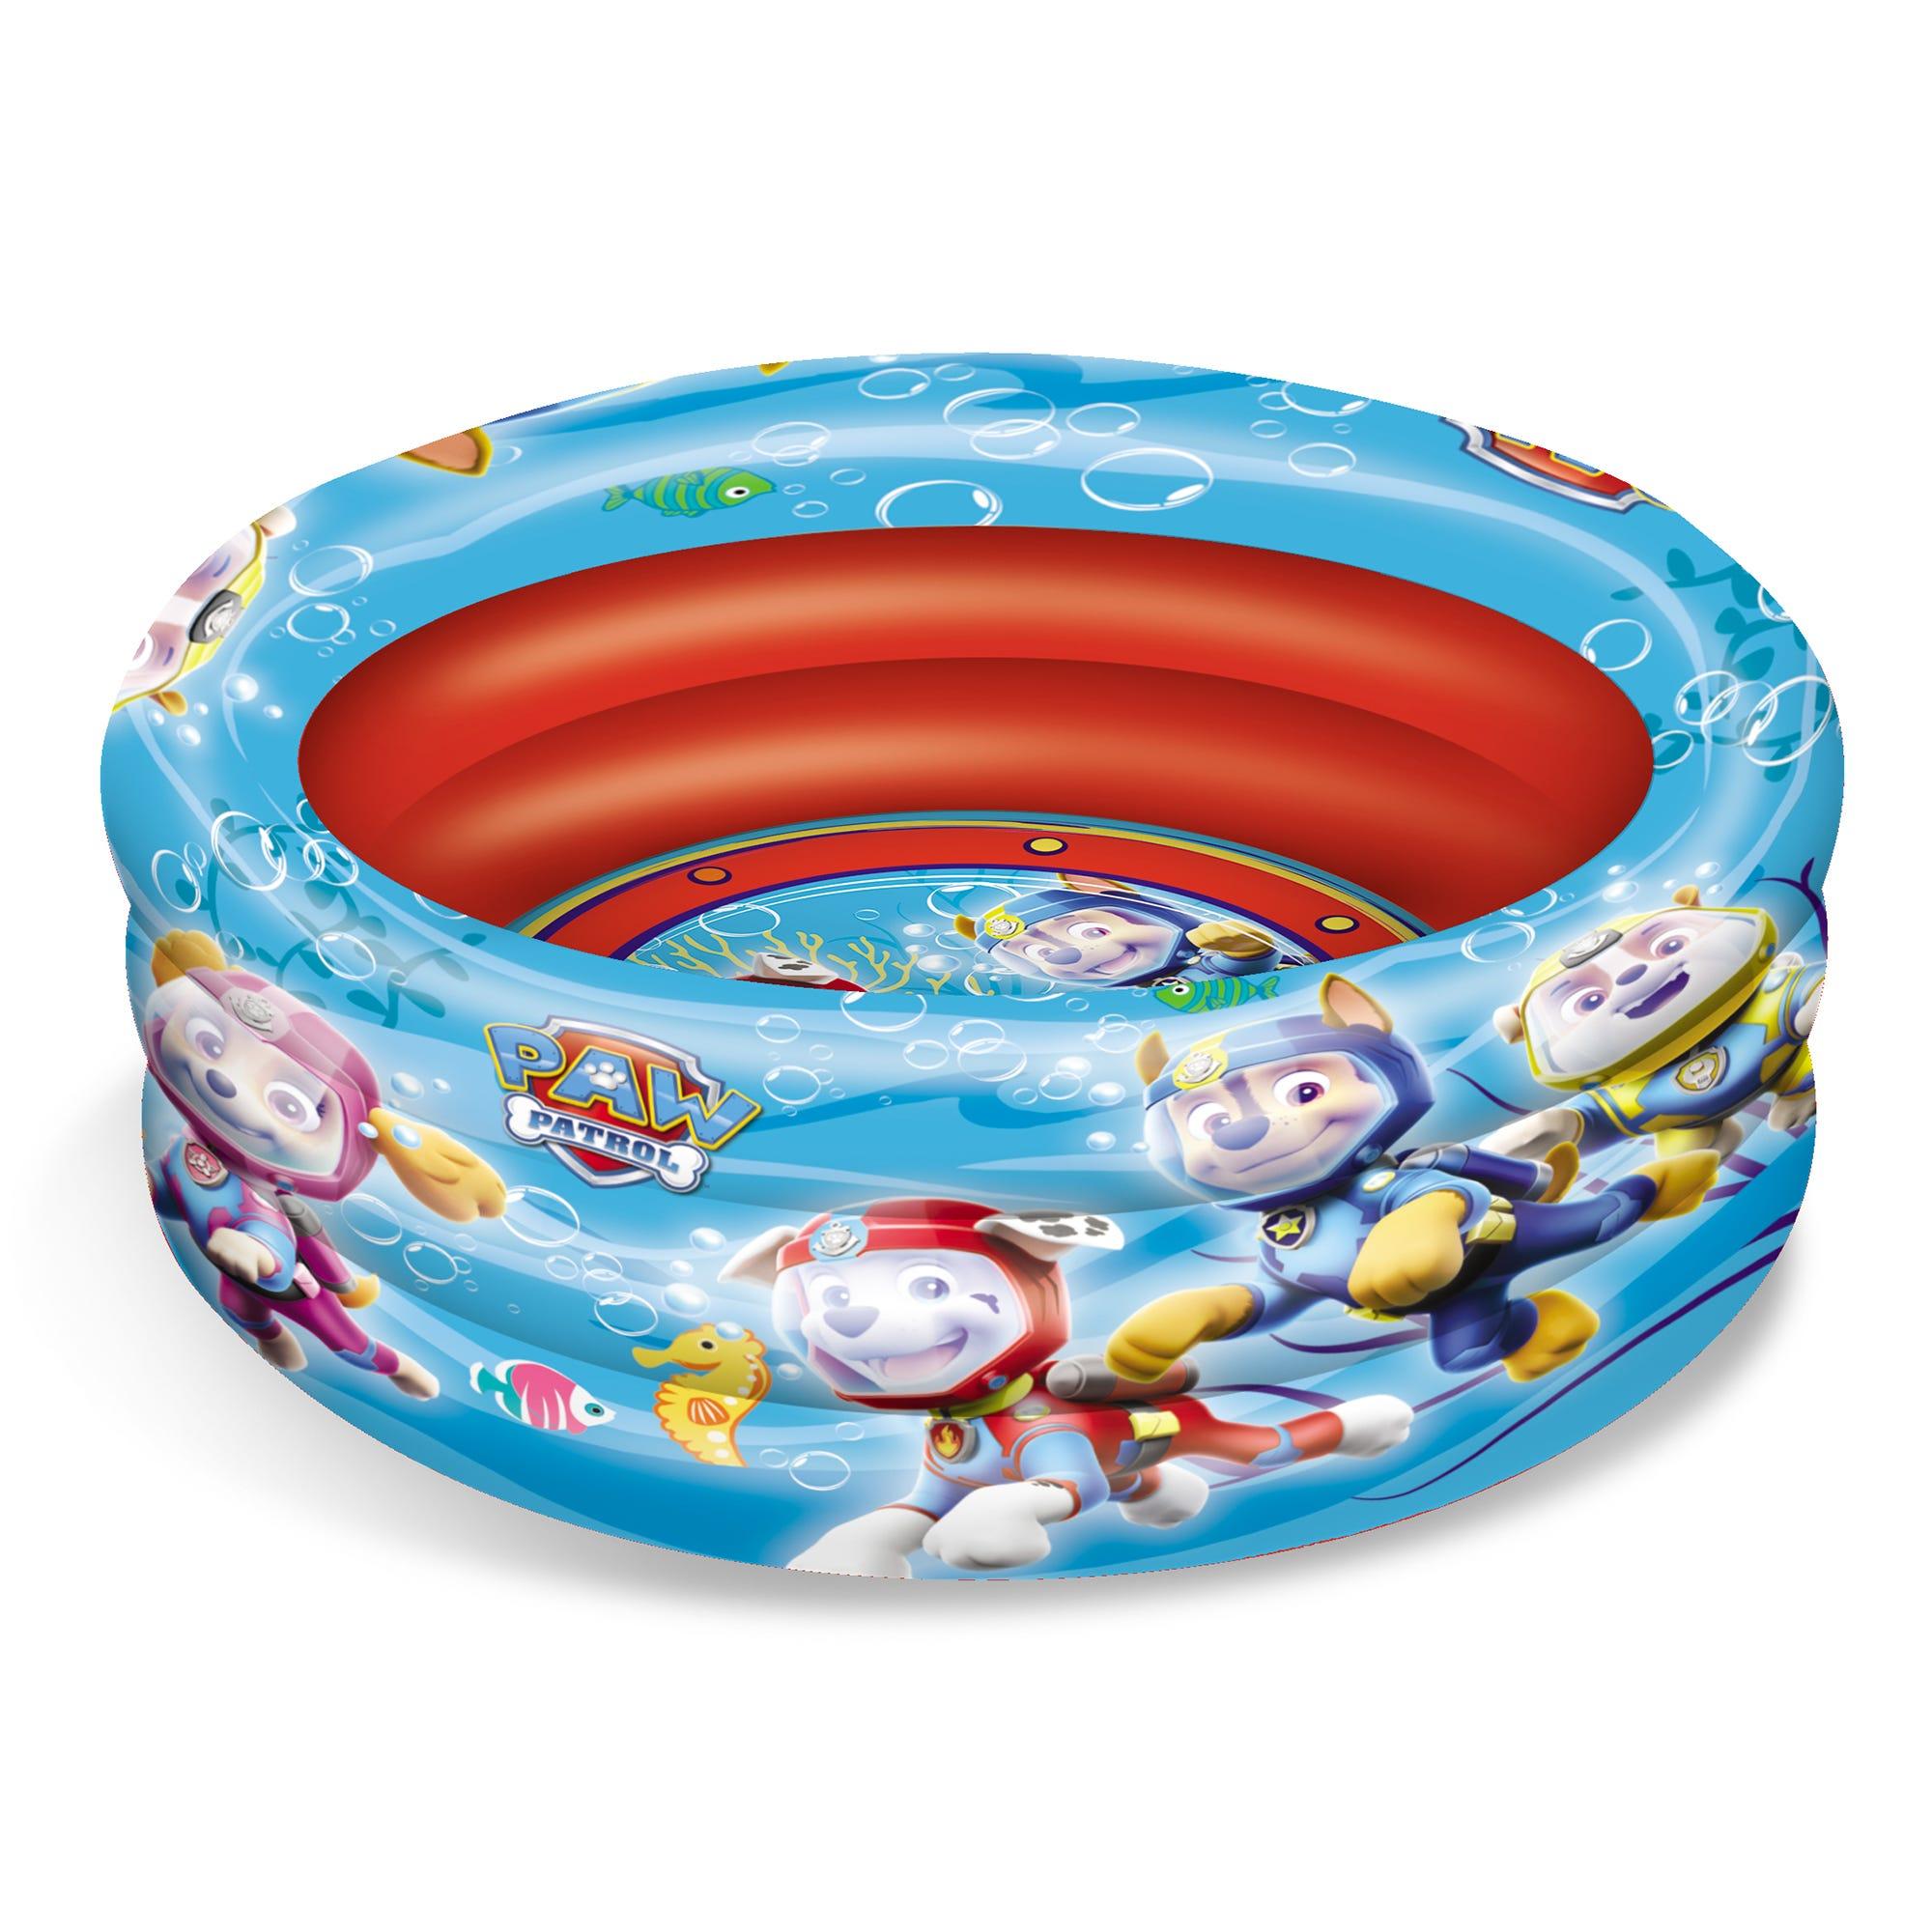 PAW Patrol 3 Ring 100cm Pool